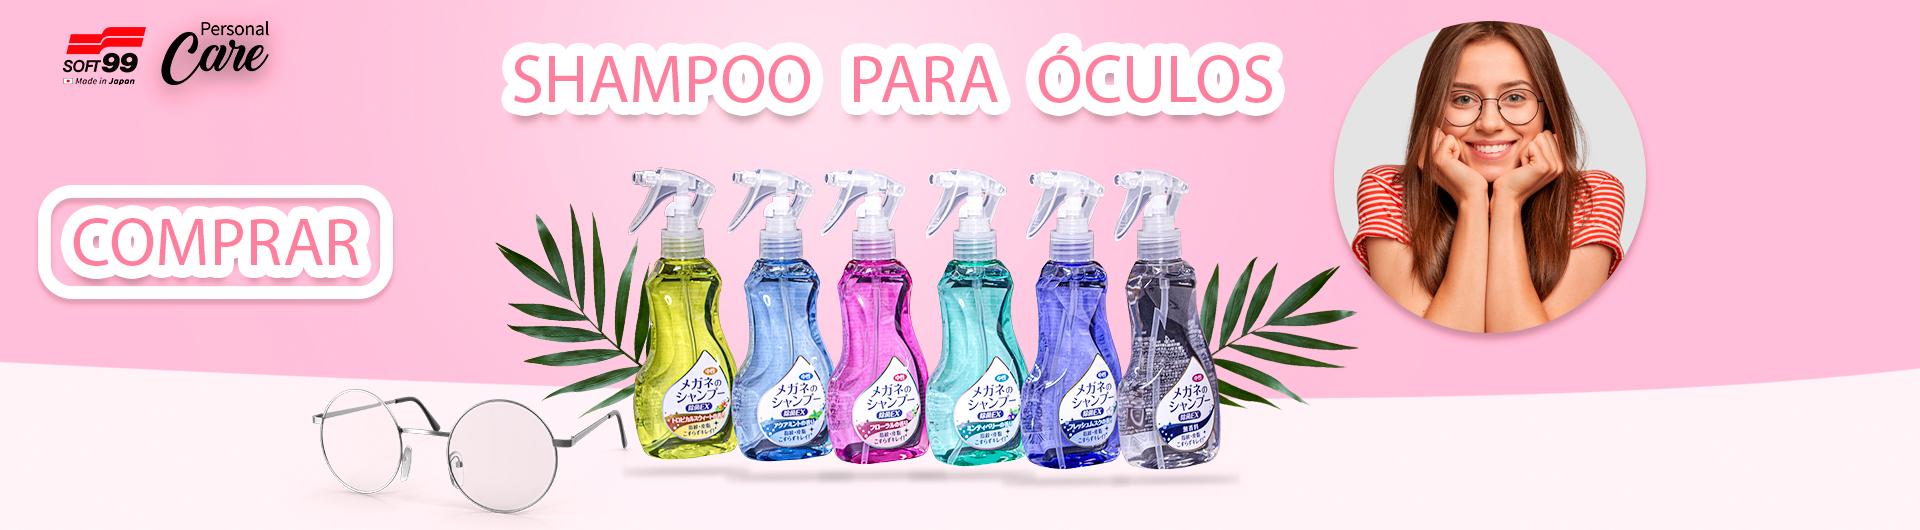 Limpa Óculos Shampoo Personal Care